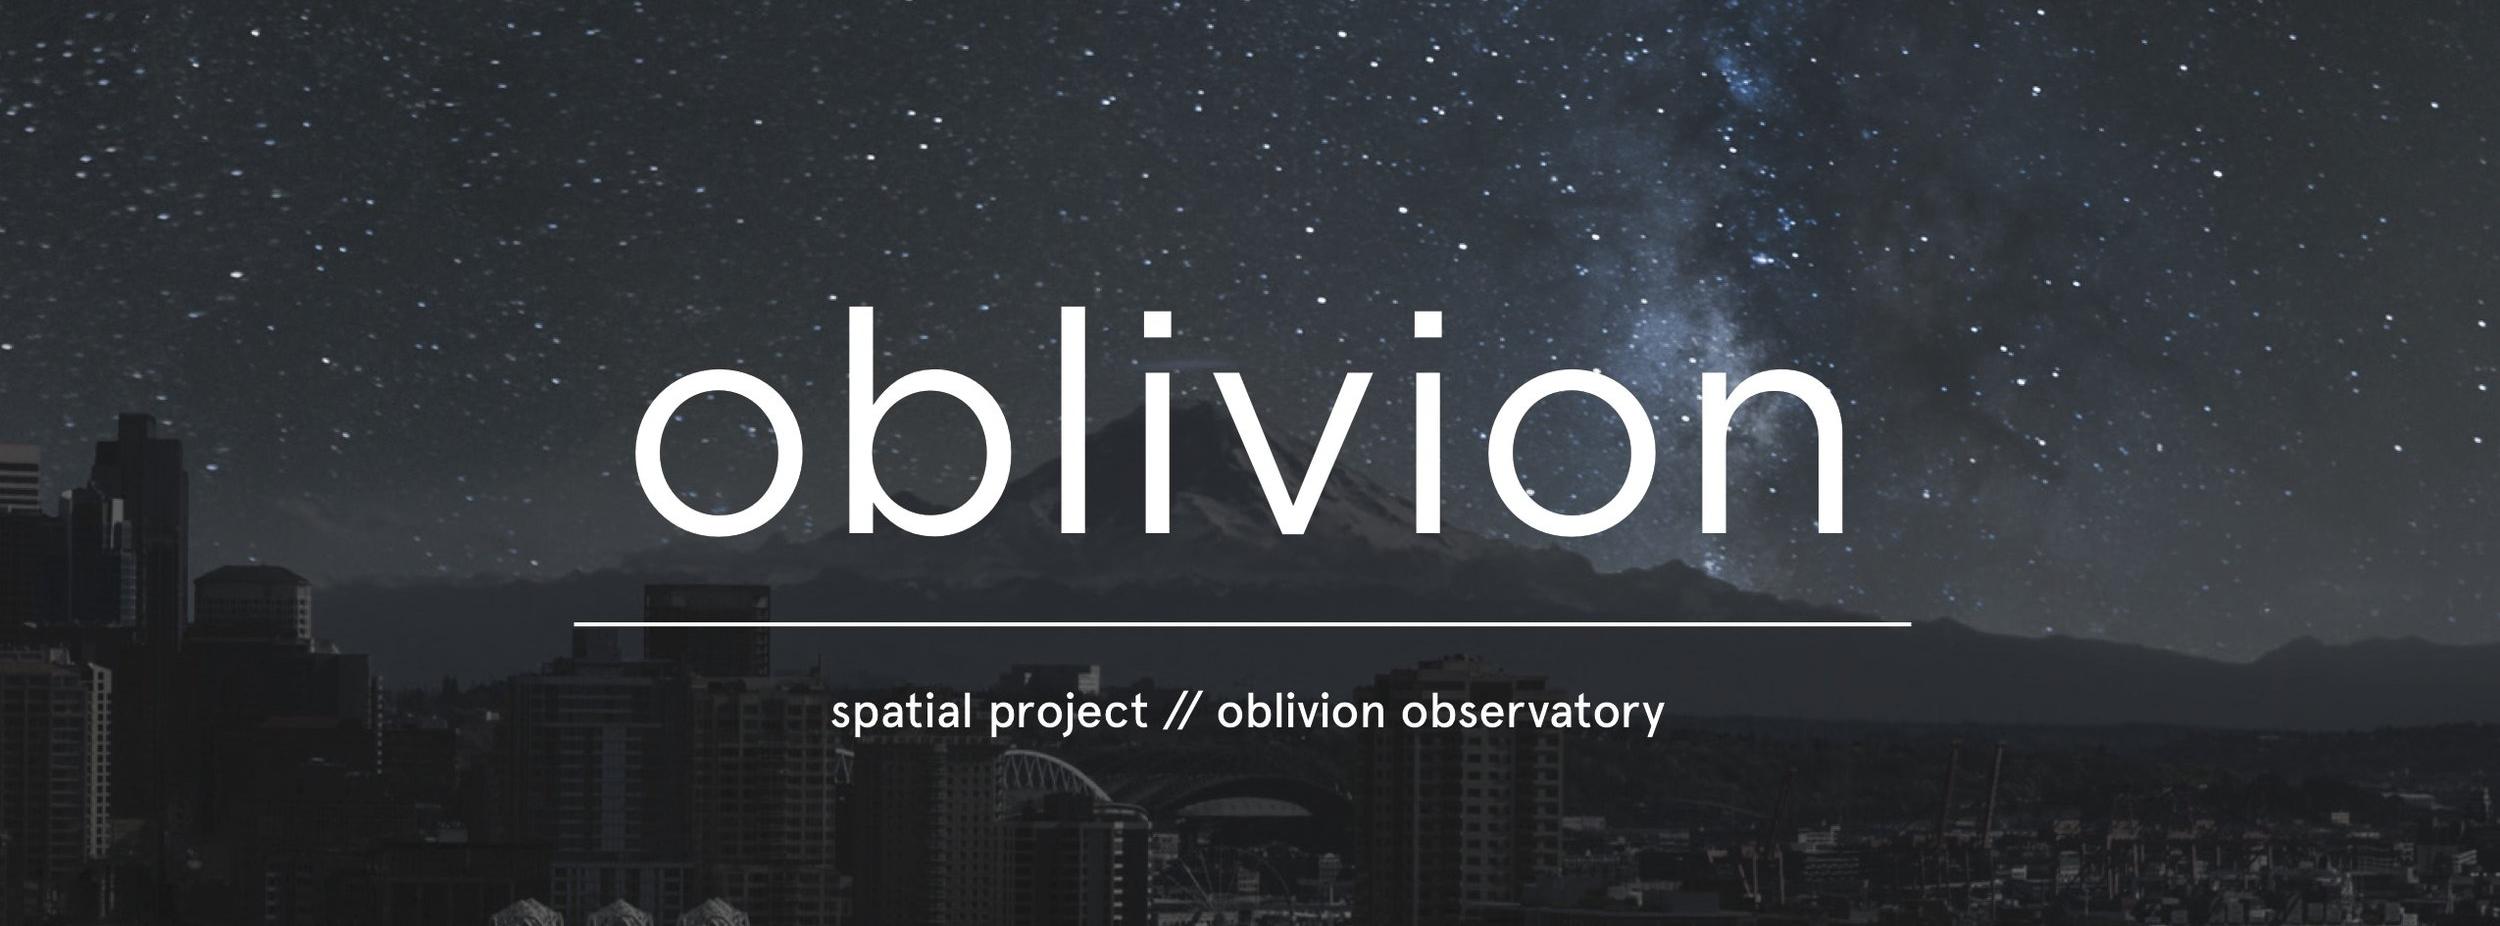 hayley_ovlivion_web_cover.jpg